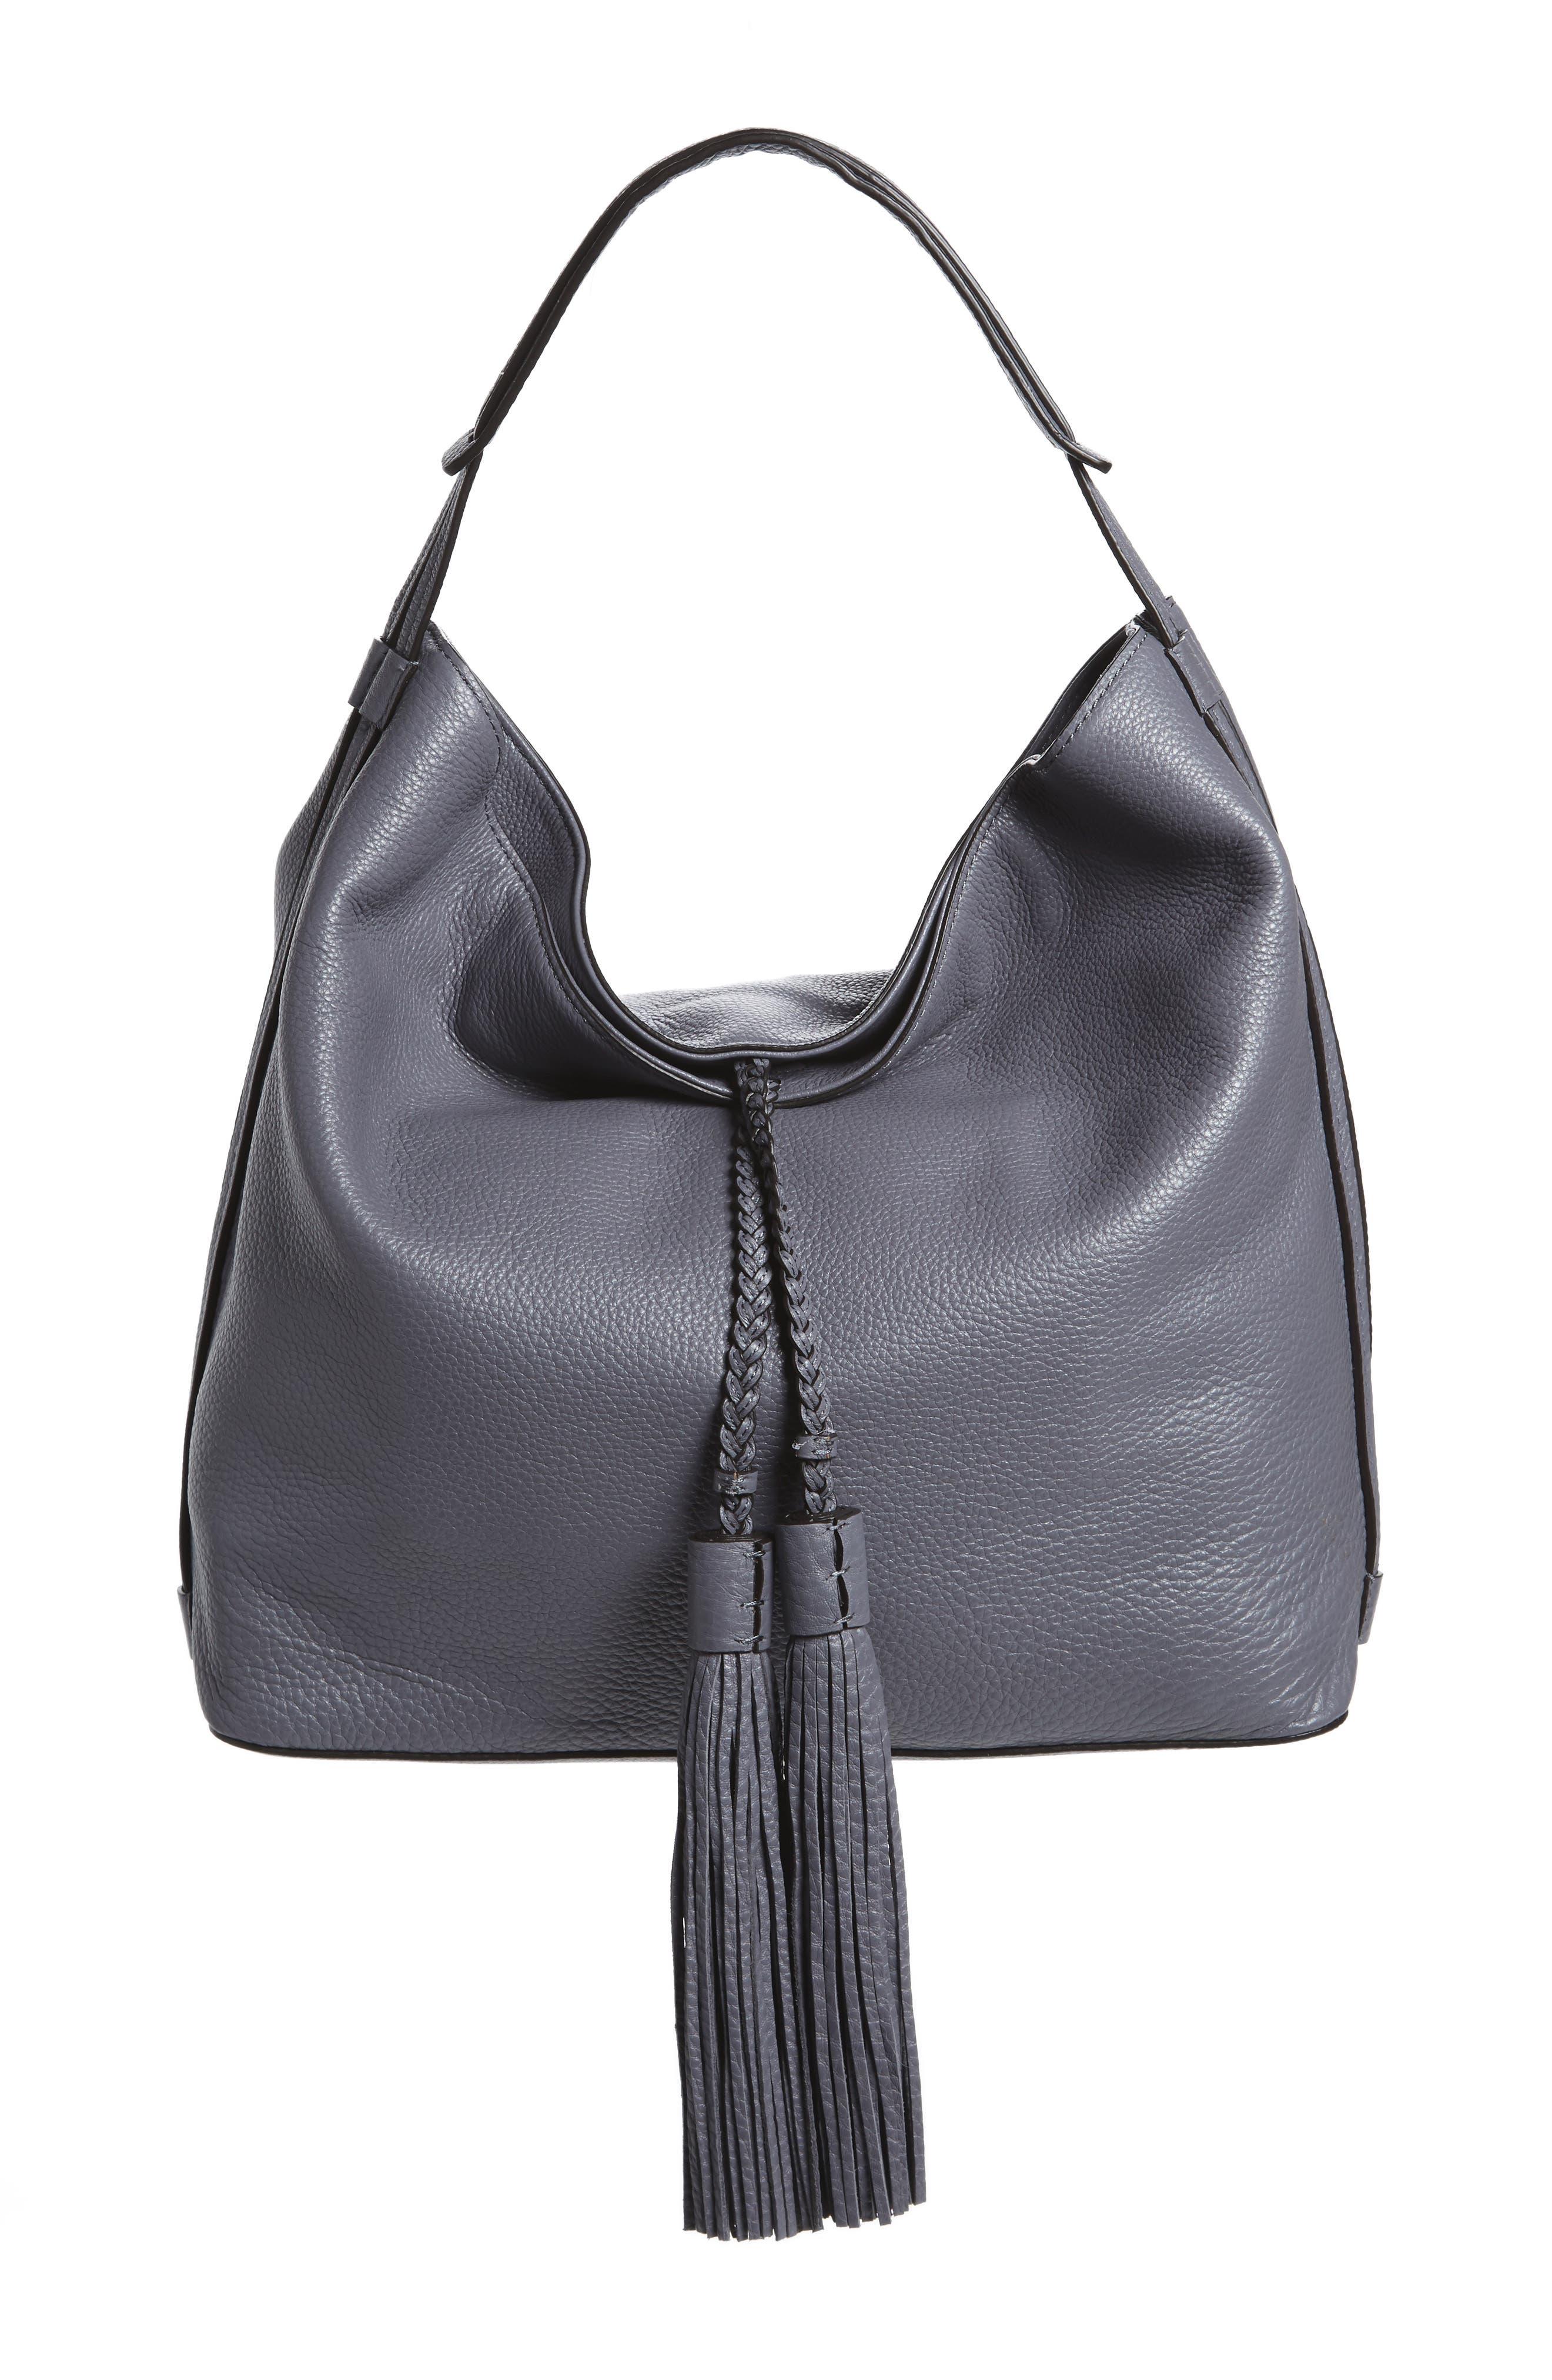 Main Image - Rebecca Minkoff Isobel Tassel Leather Hobo